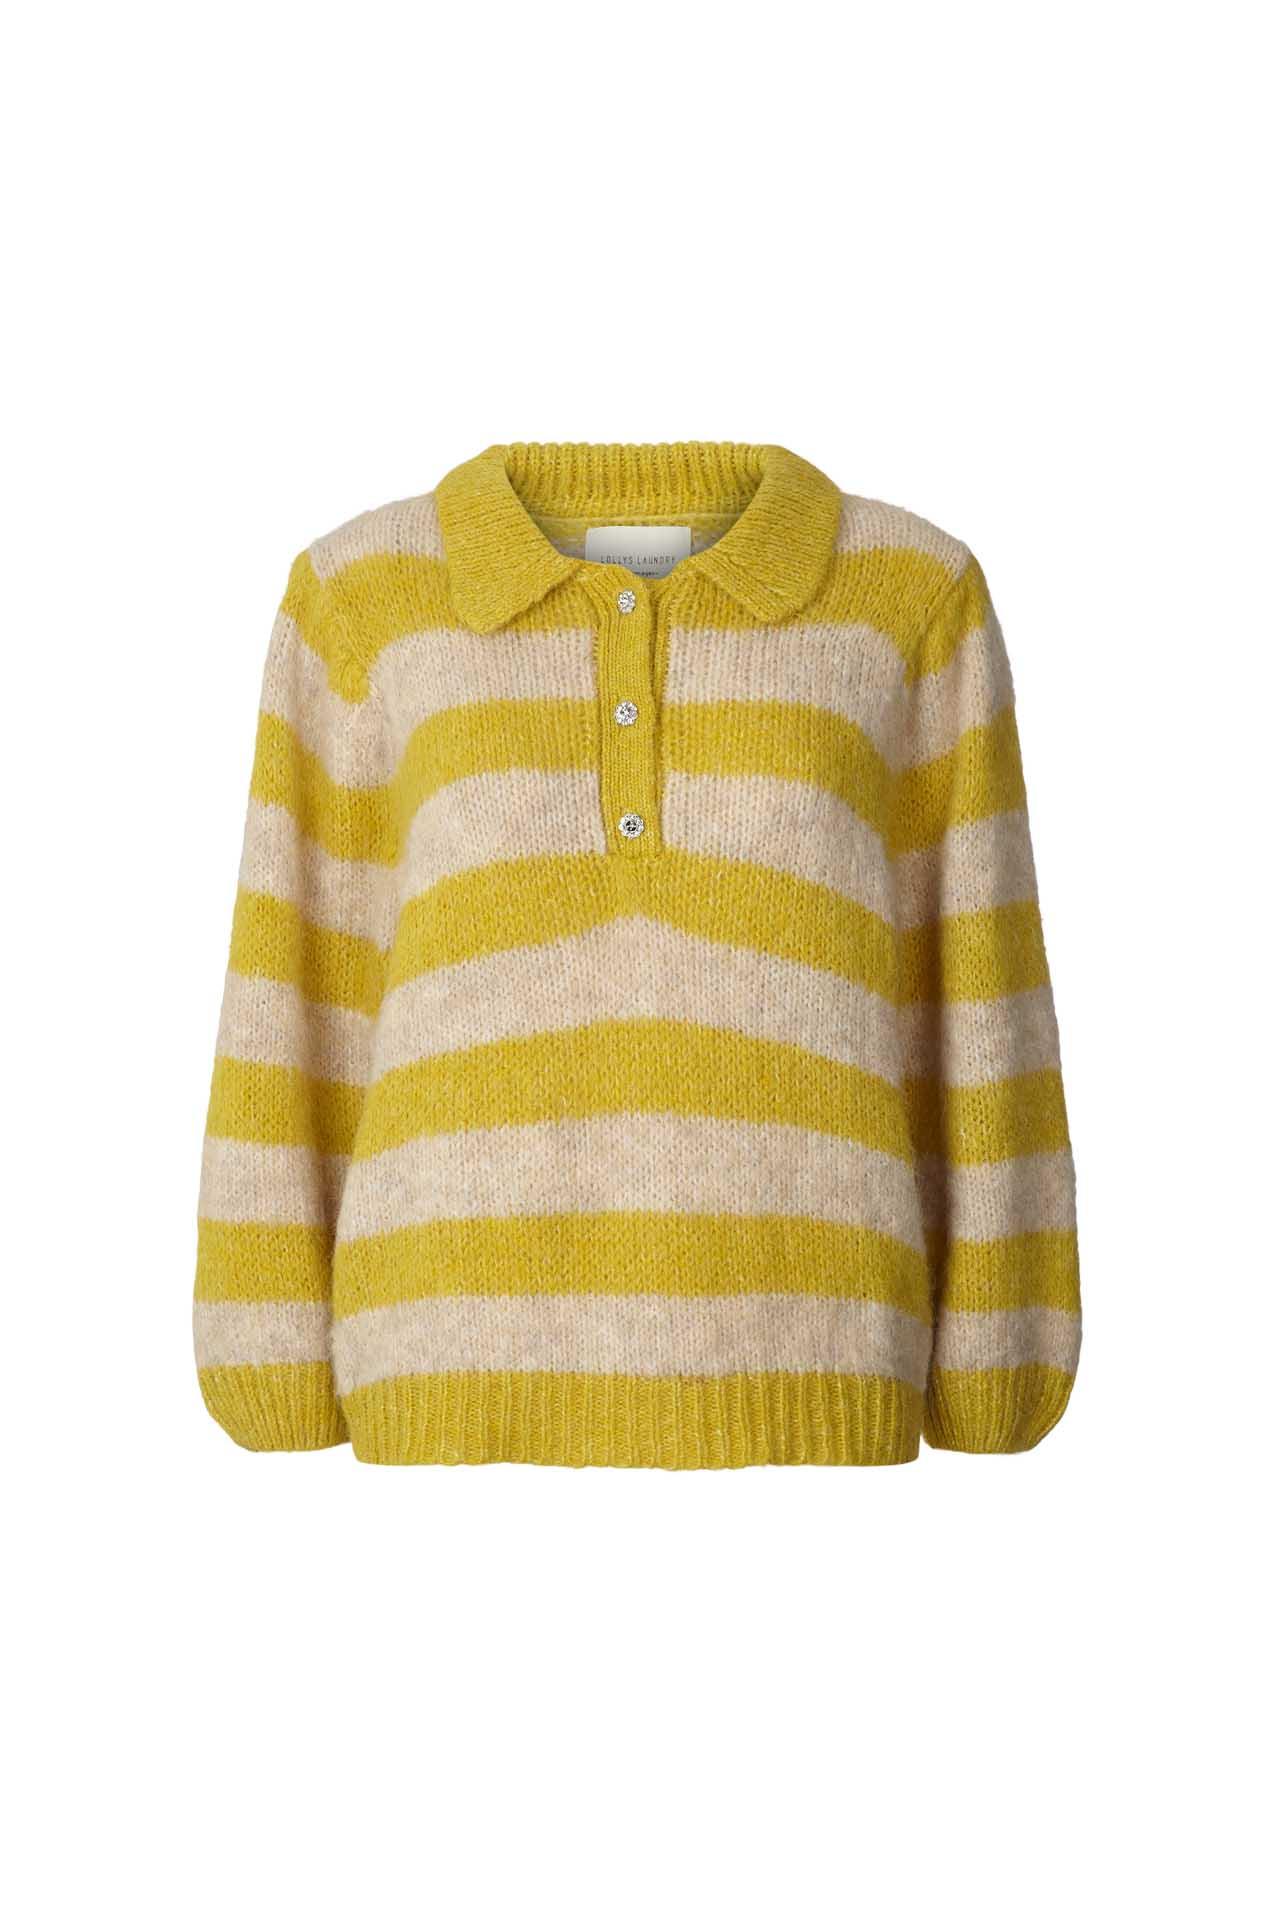 Lollys Laundry Dylan striktrøje, yellow, large